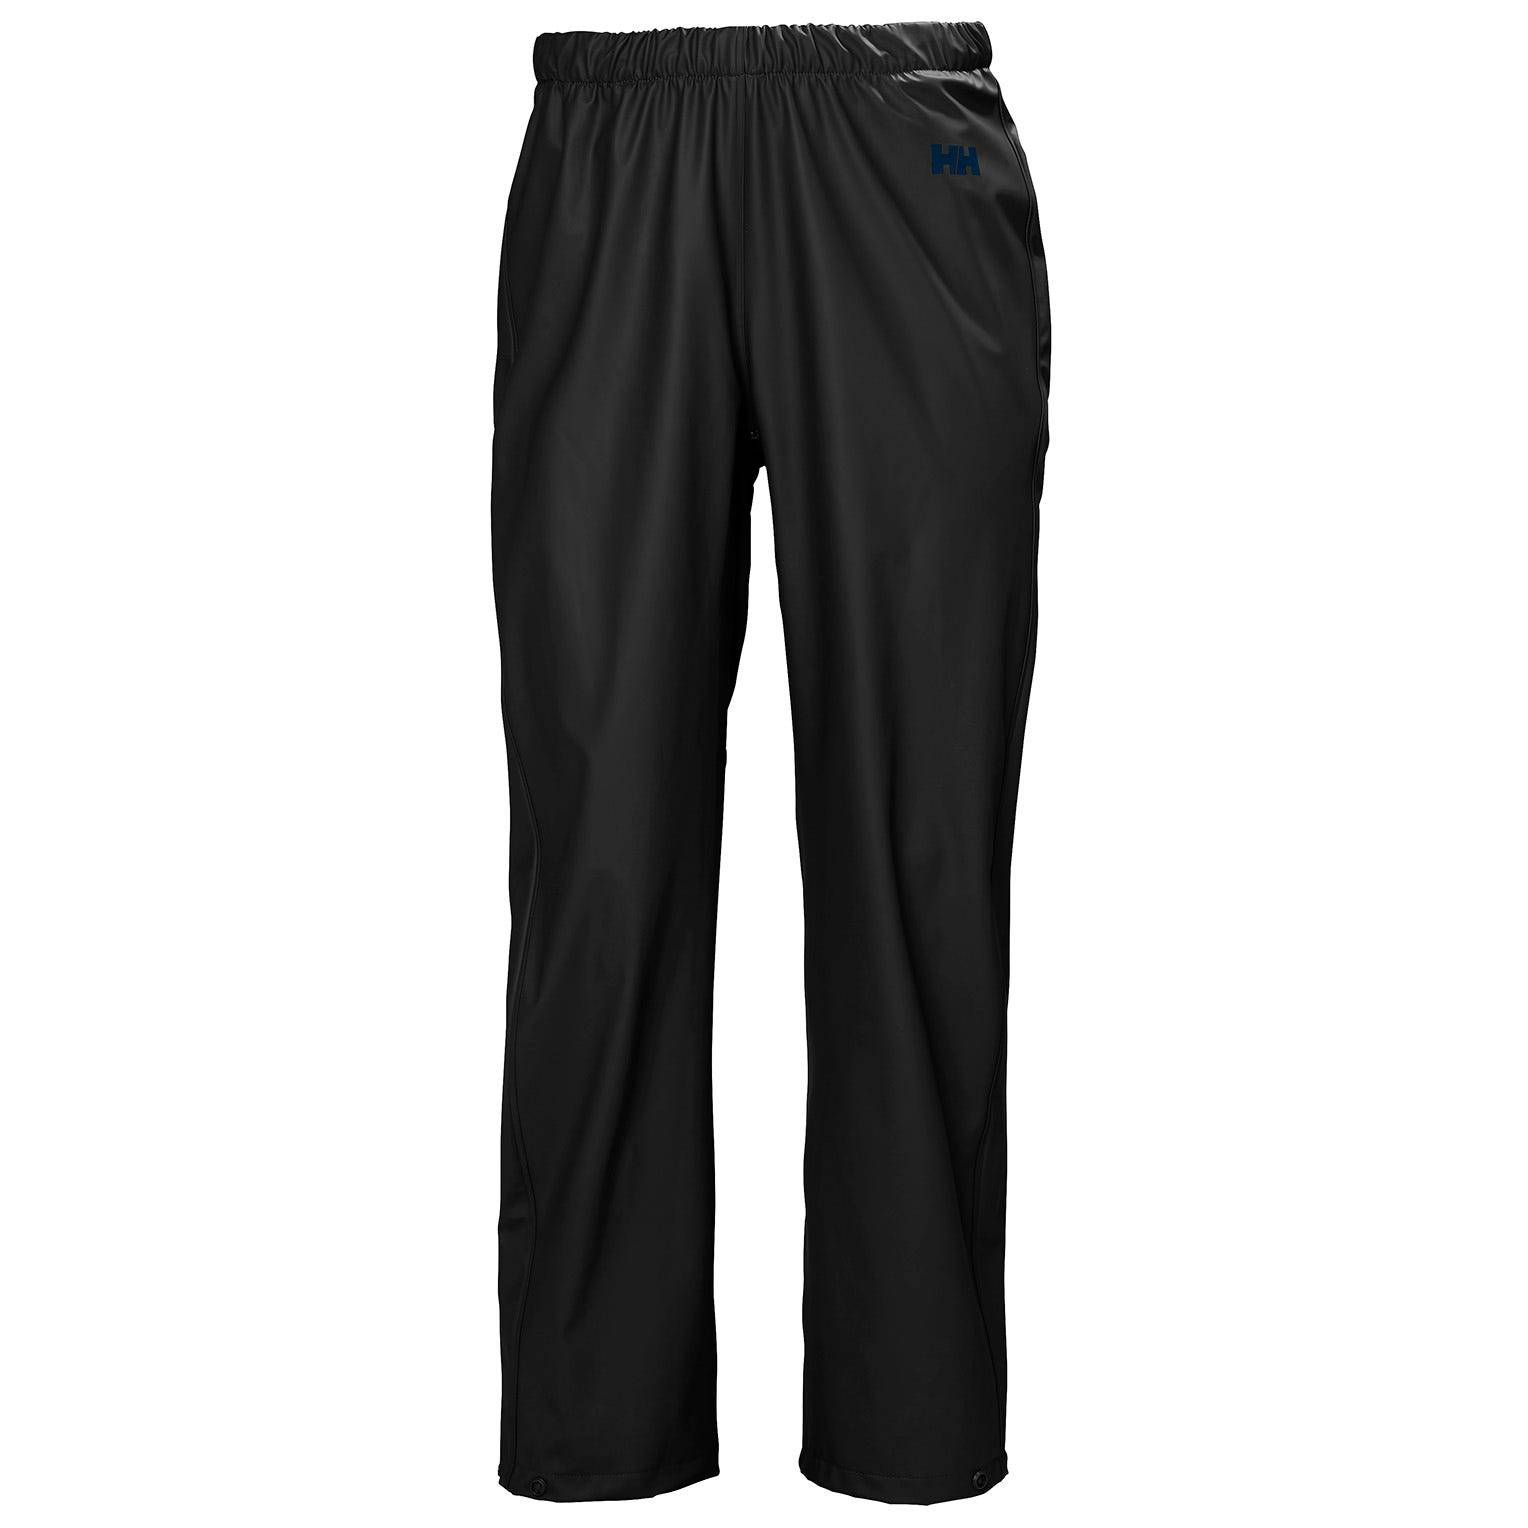 Helly Hansen W Loke Pants Womens Hiking Pant Black XXL